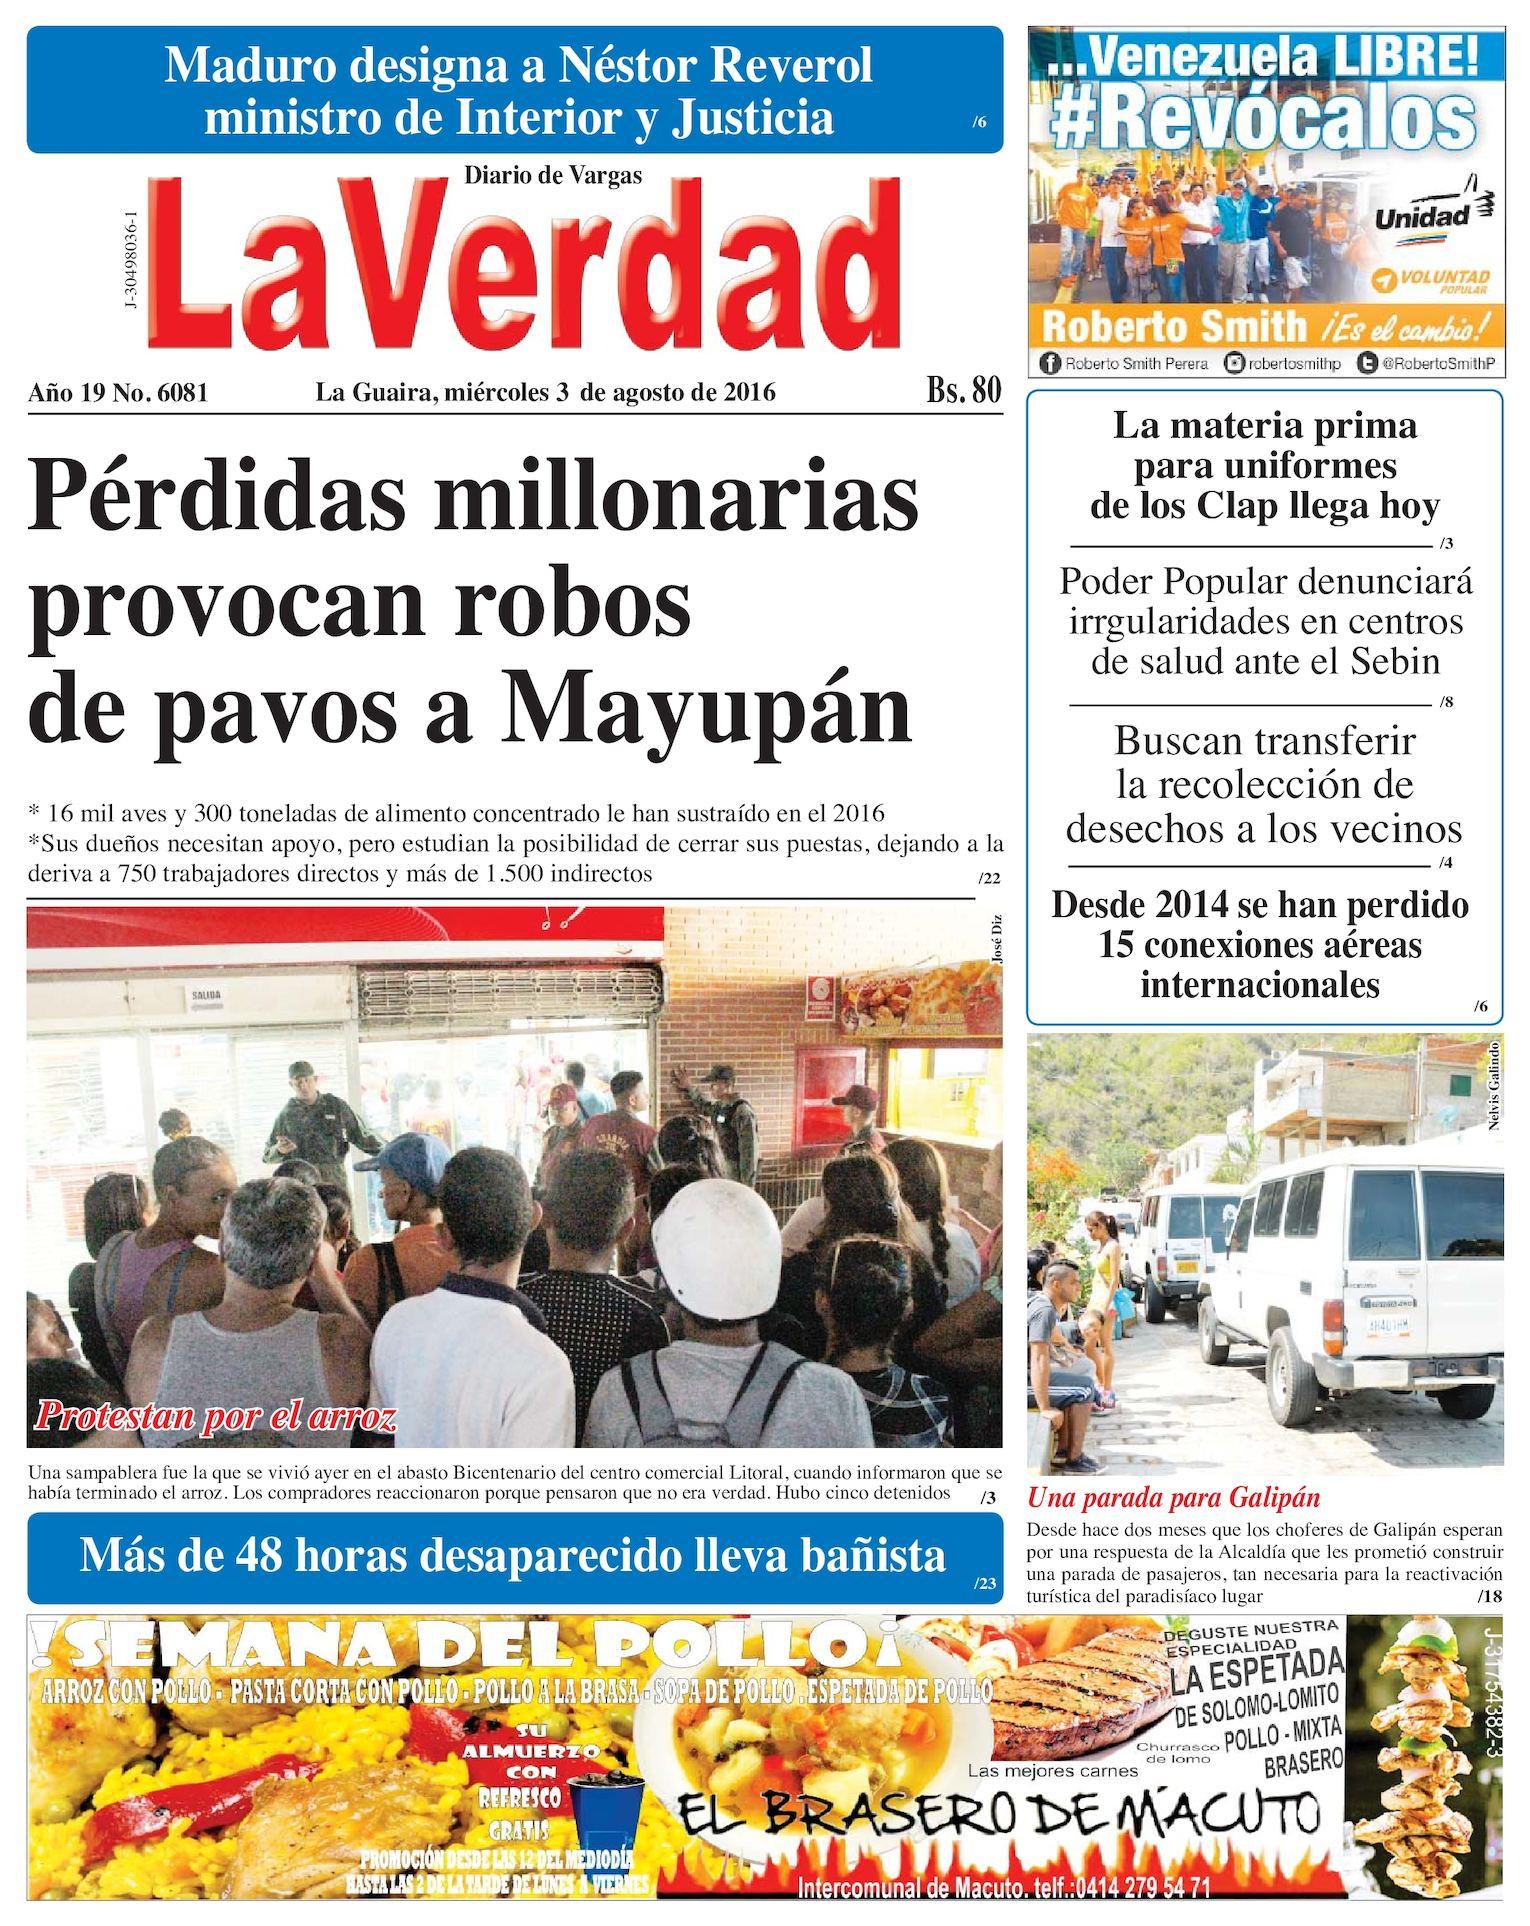 Calaméo - La Guaira, miercoles 03 de agosto de 2016 Año 19 Nº. 6081